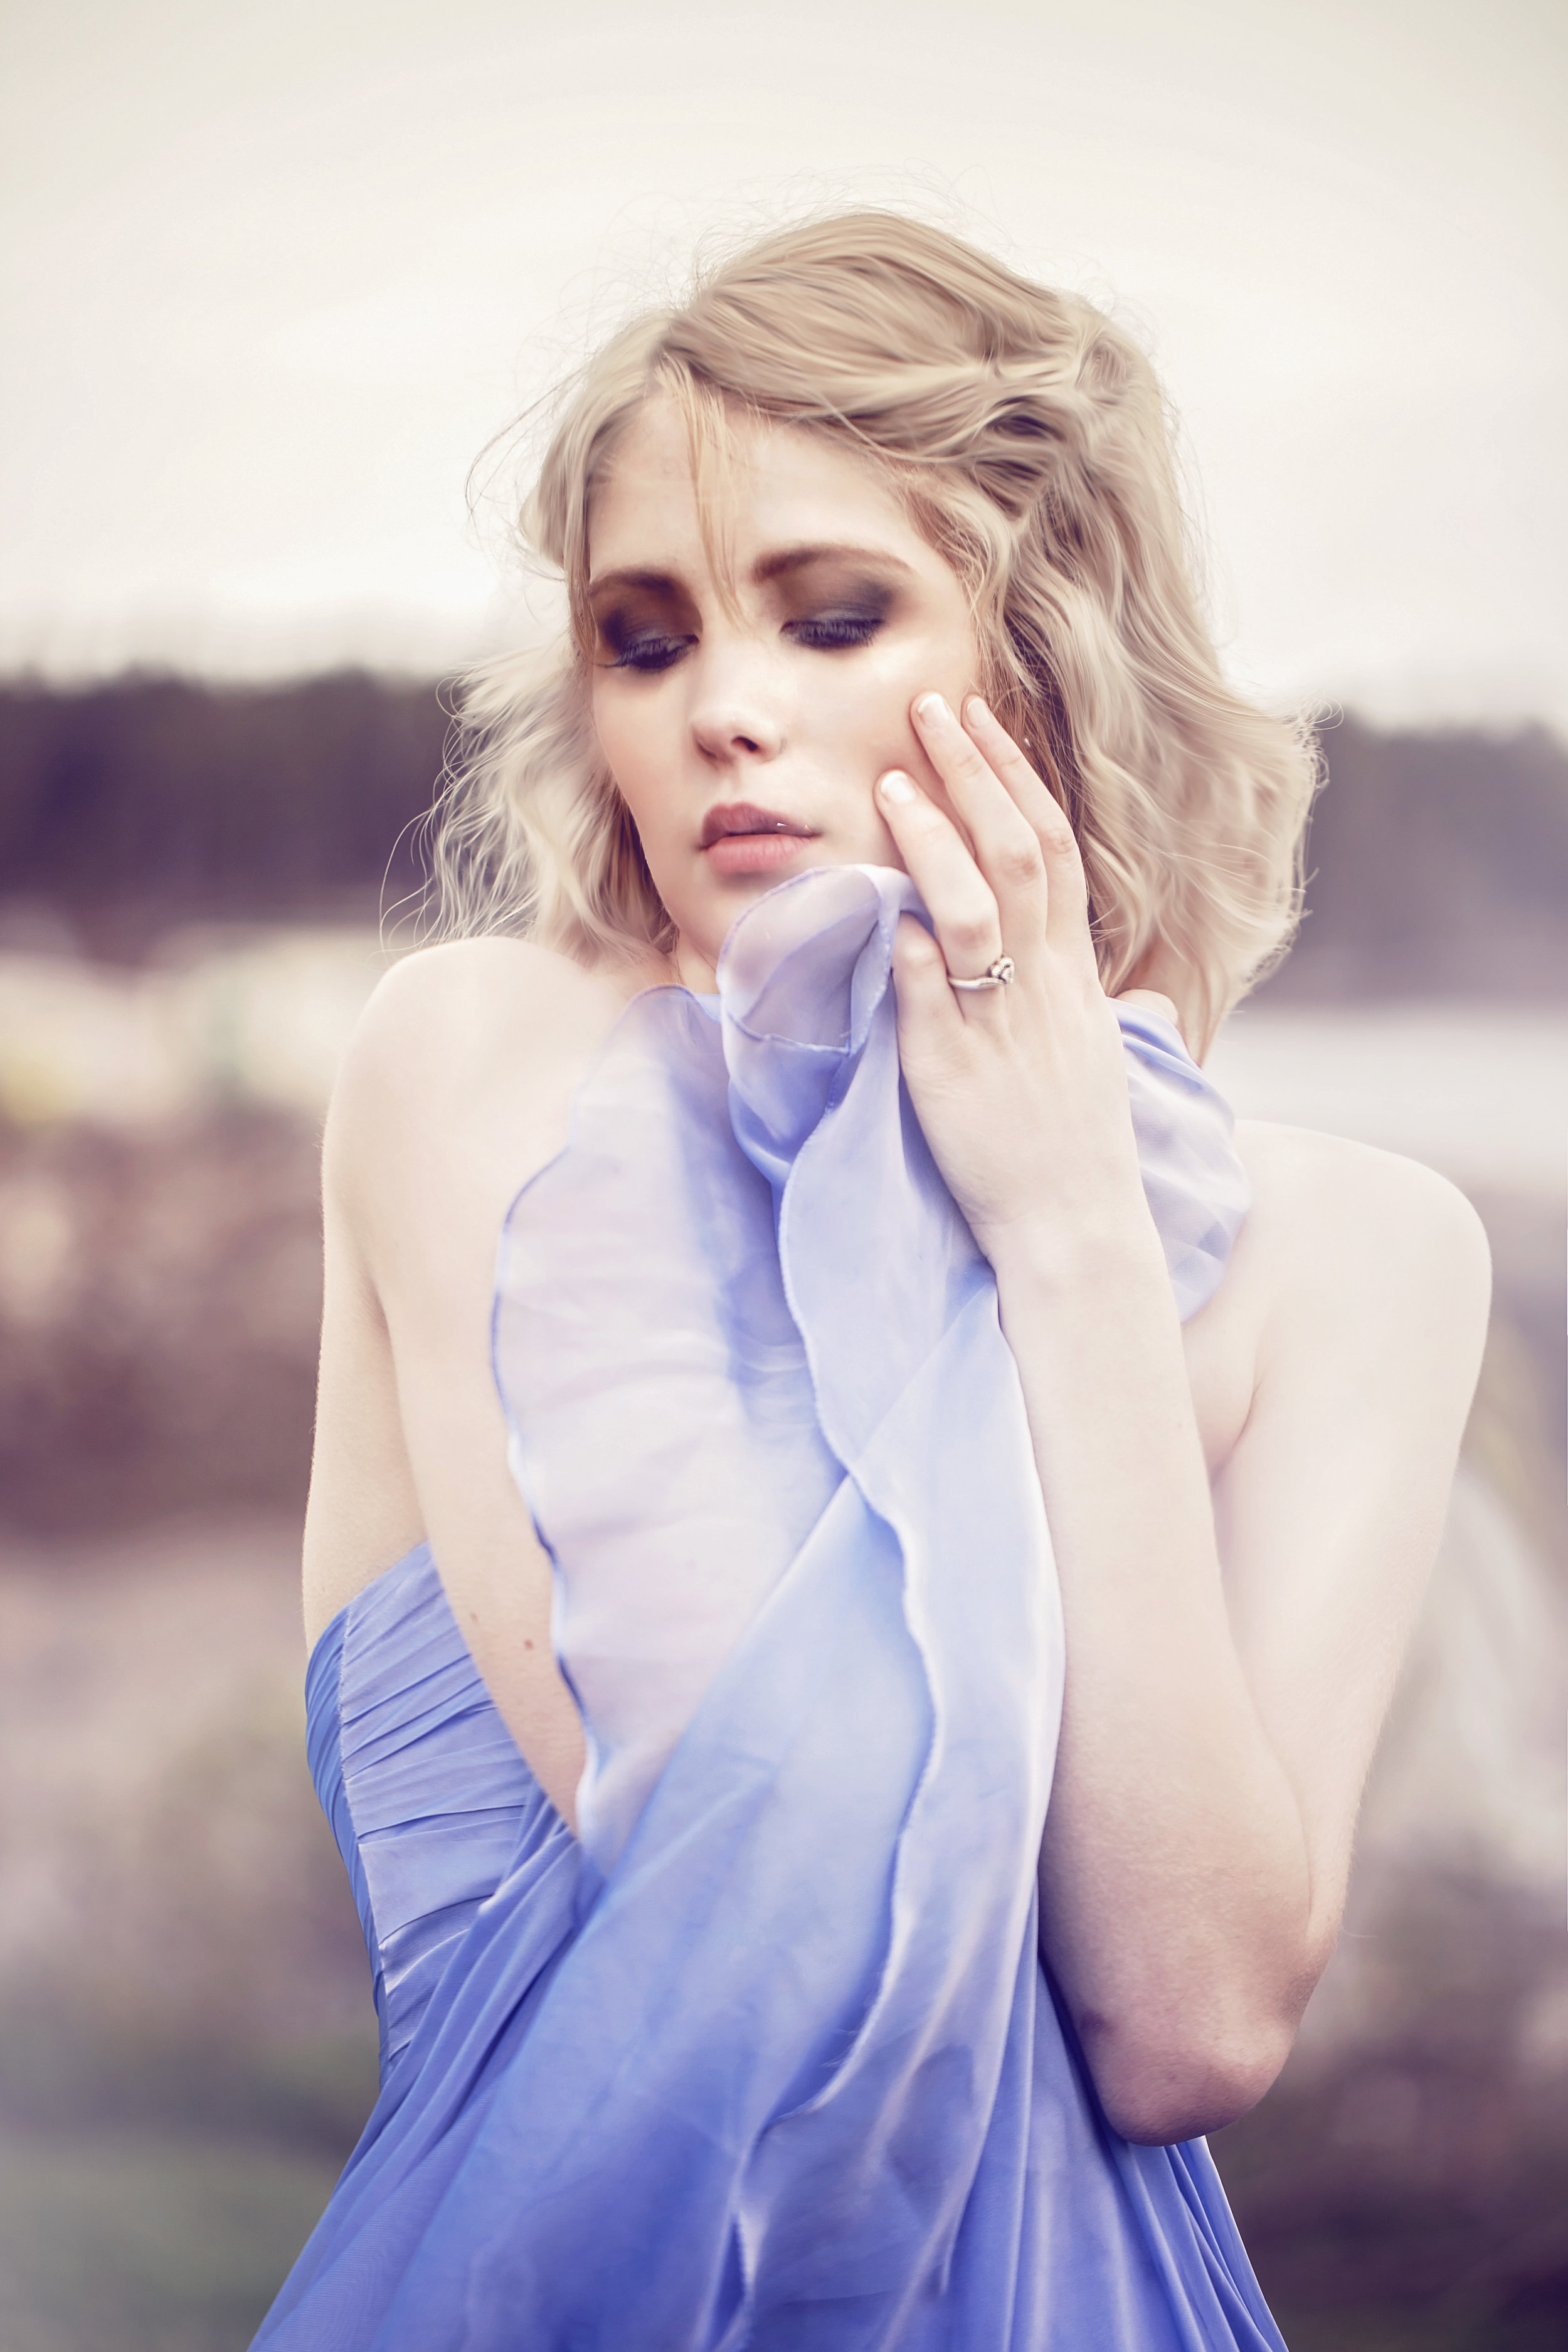 Blonde-dreamy-dreamworld-red bank-photo-cate-scaglione.jpg